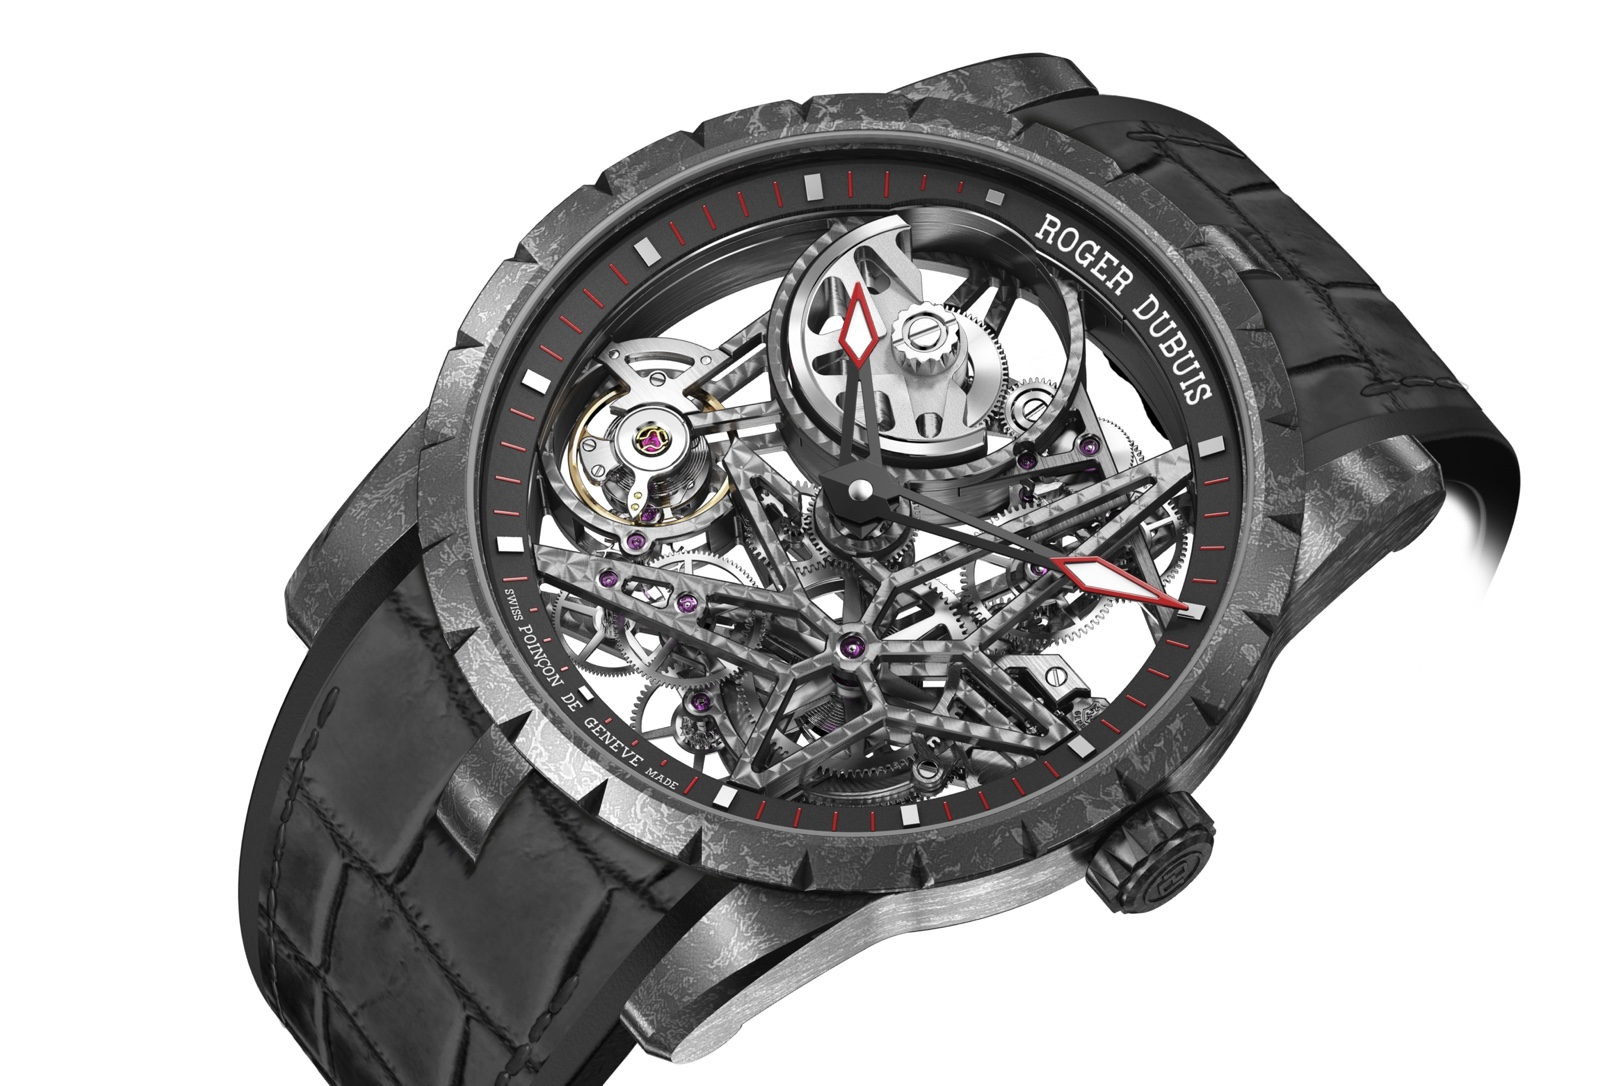 Roger-Dubuis-Excalibur-Skeleton-Automatic-Carbon